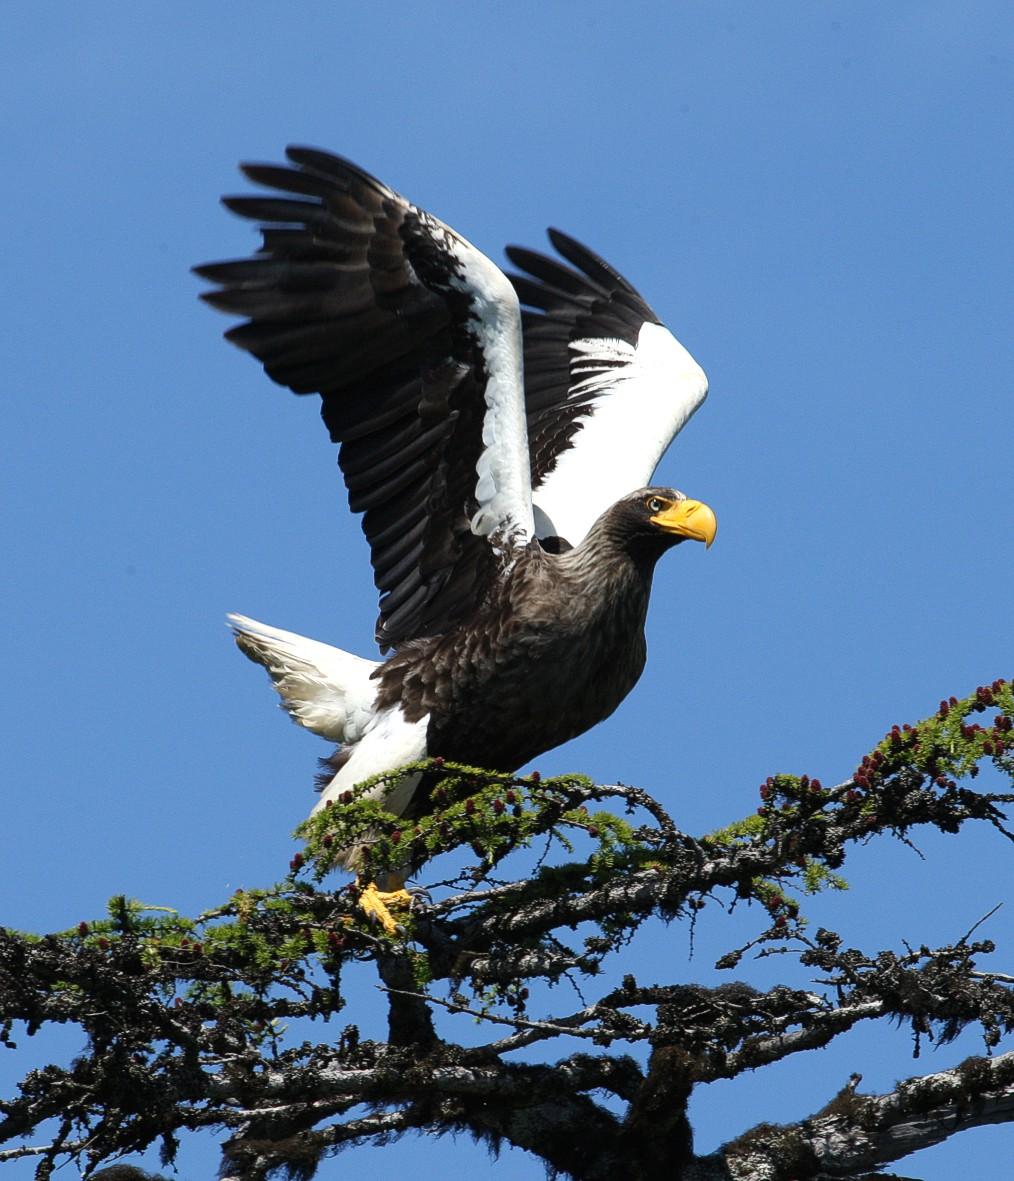 Птица 2019 года - Тихоокеанский орлан